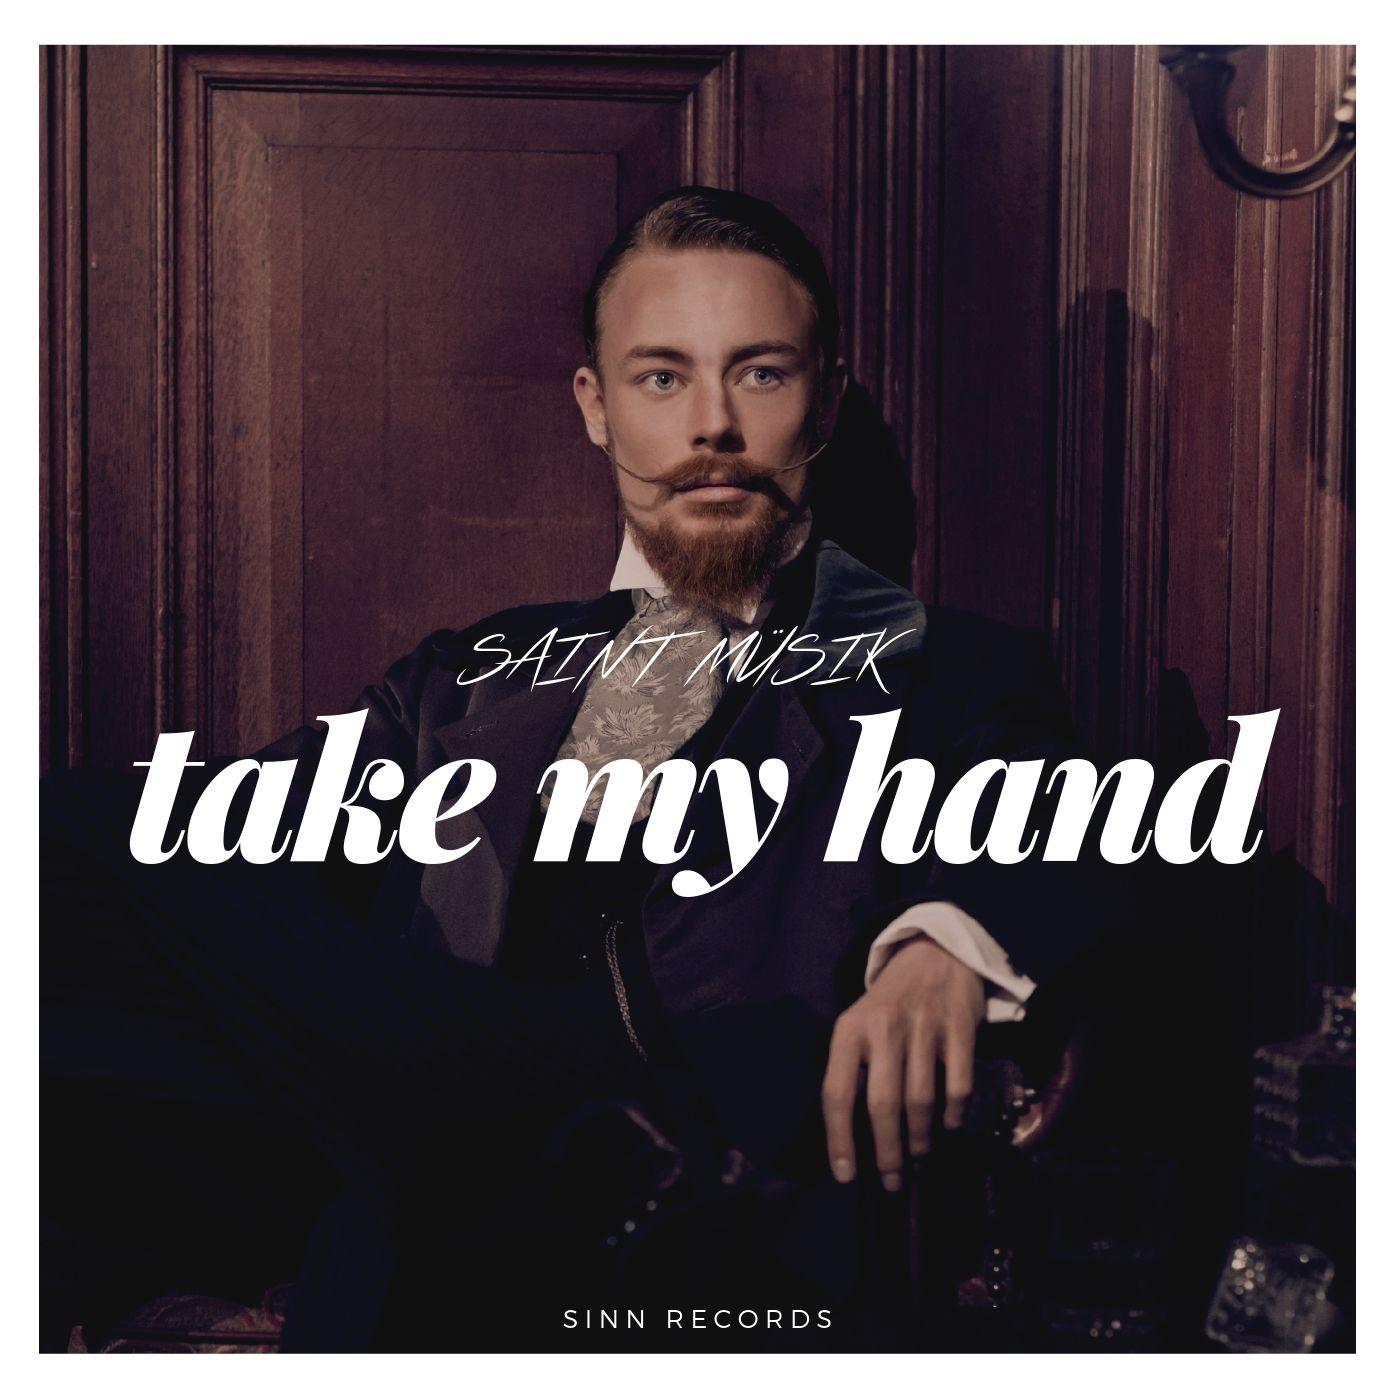 saint_musik_-_take_my_hand_sinn_records.jpg